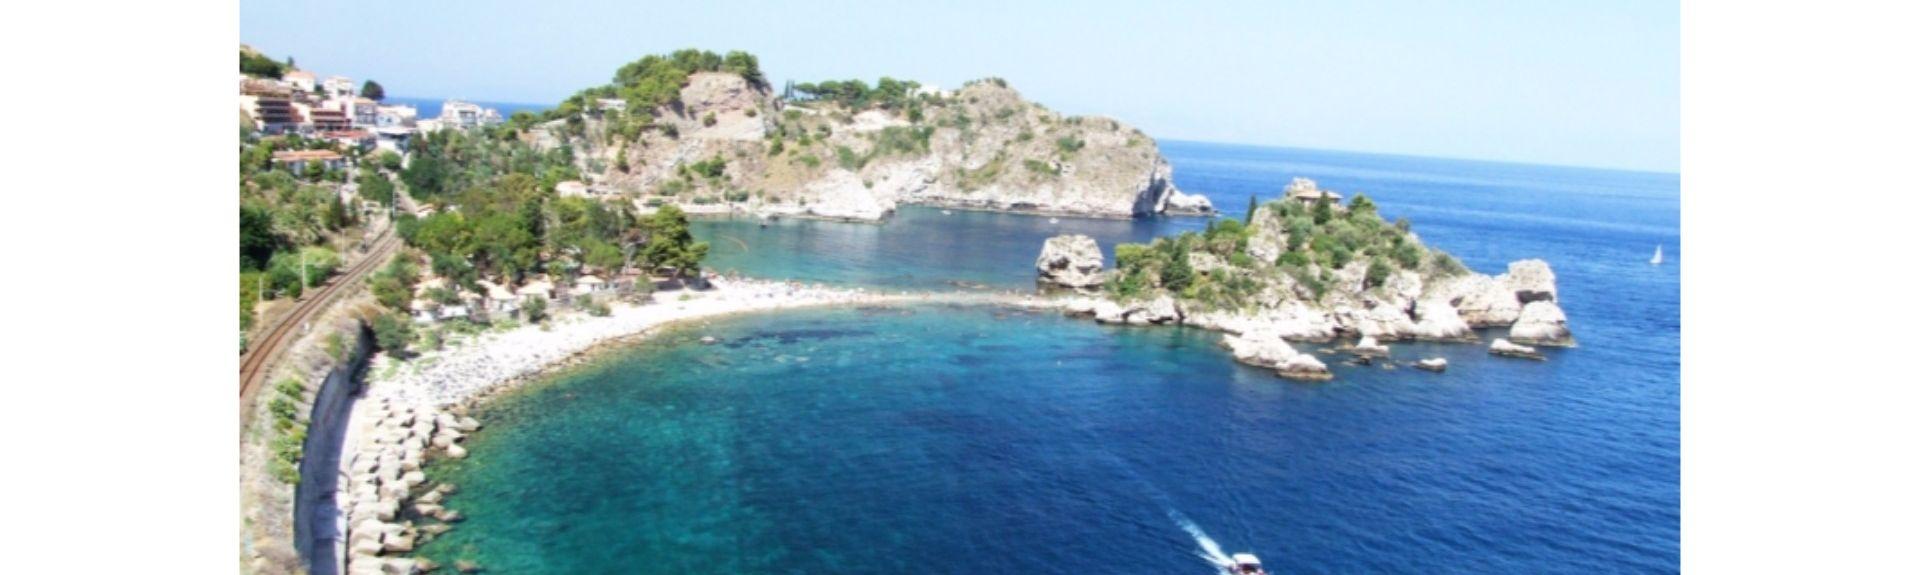 Terme Vigliatore, Sicilien, Italien